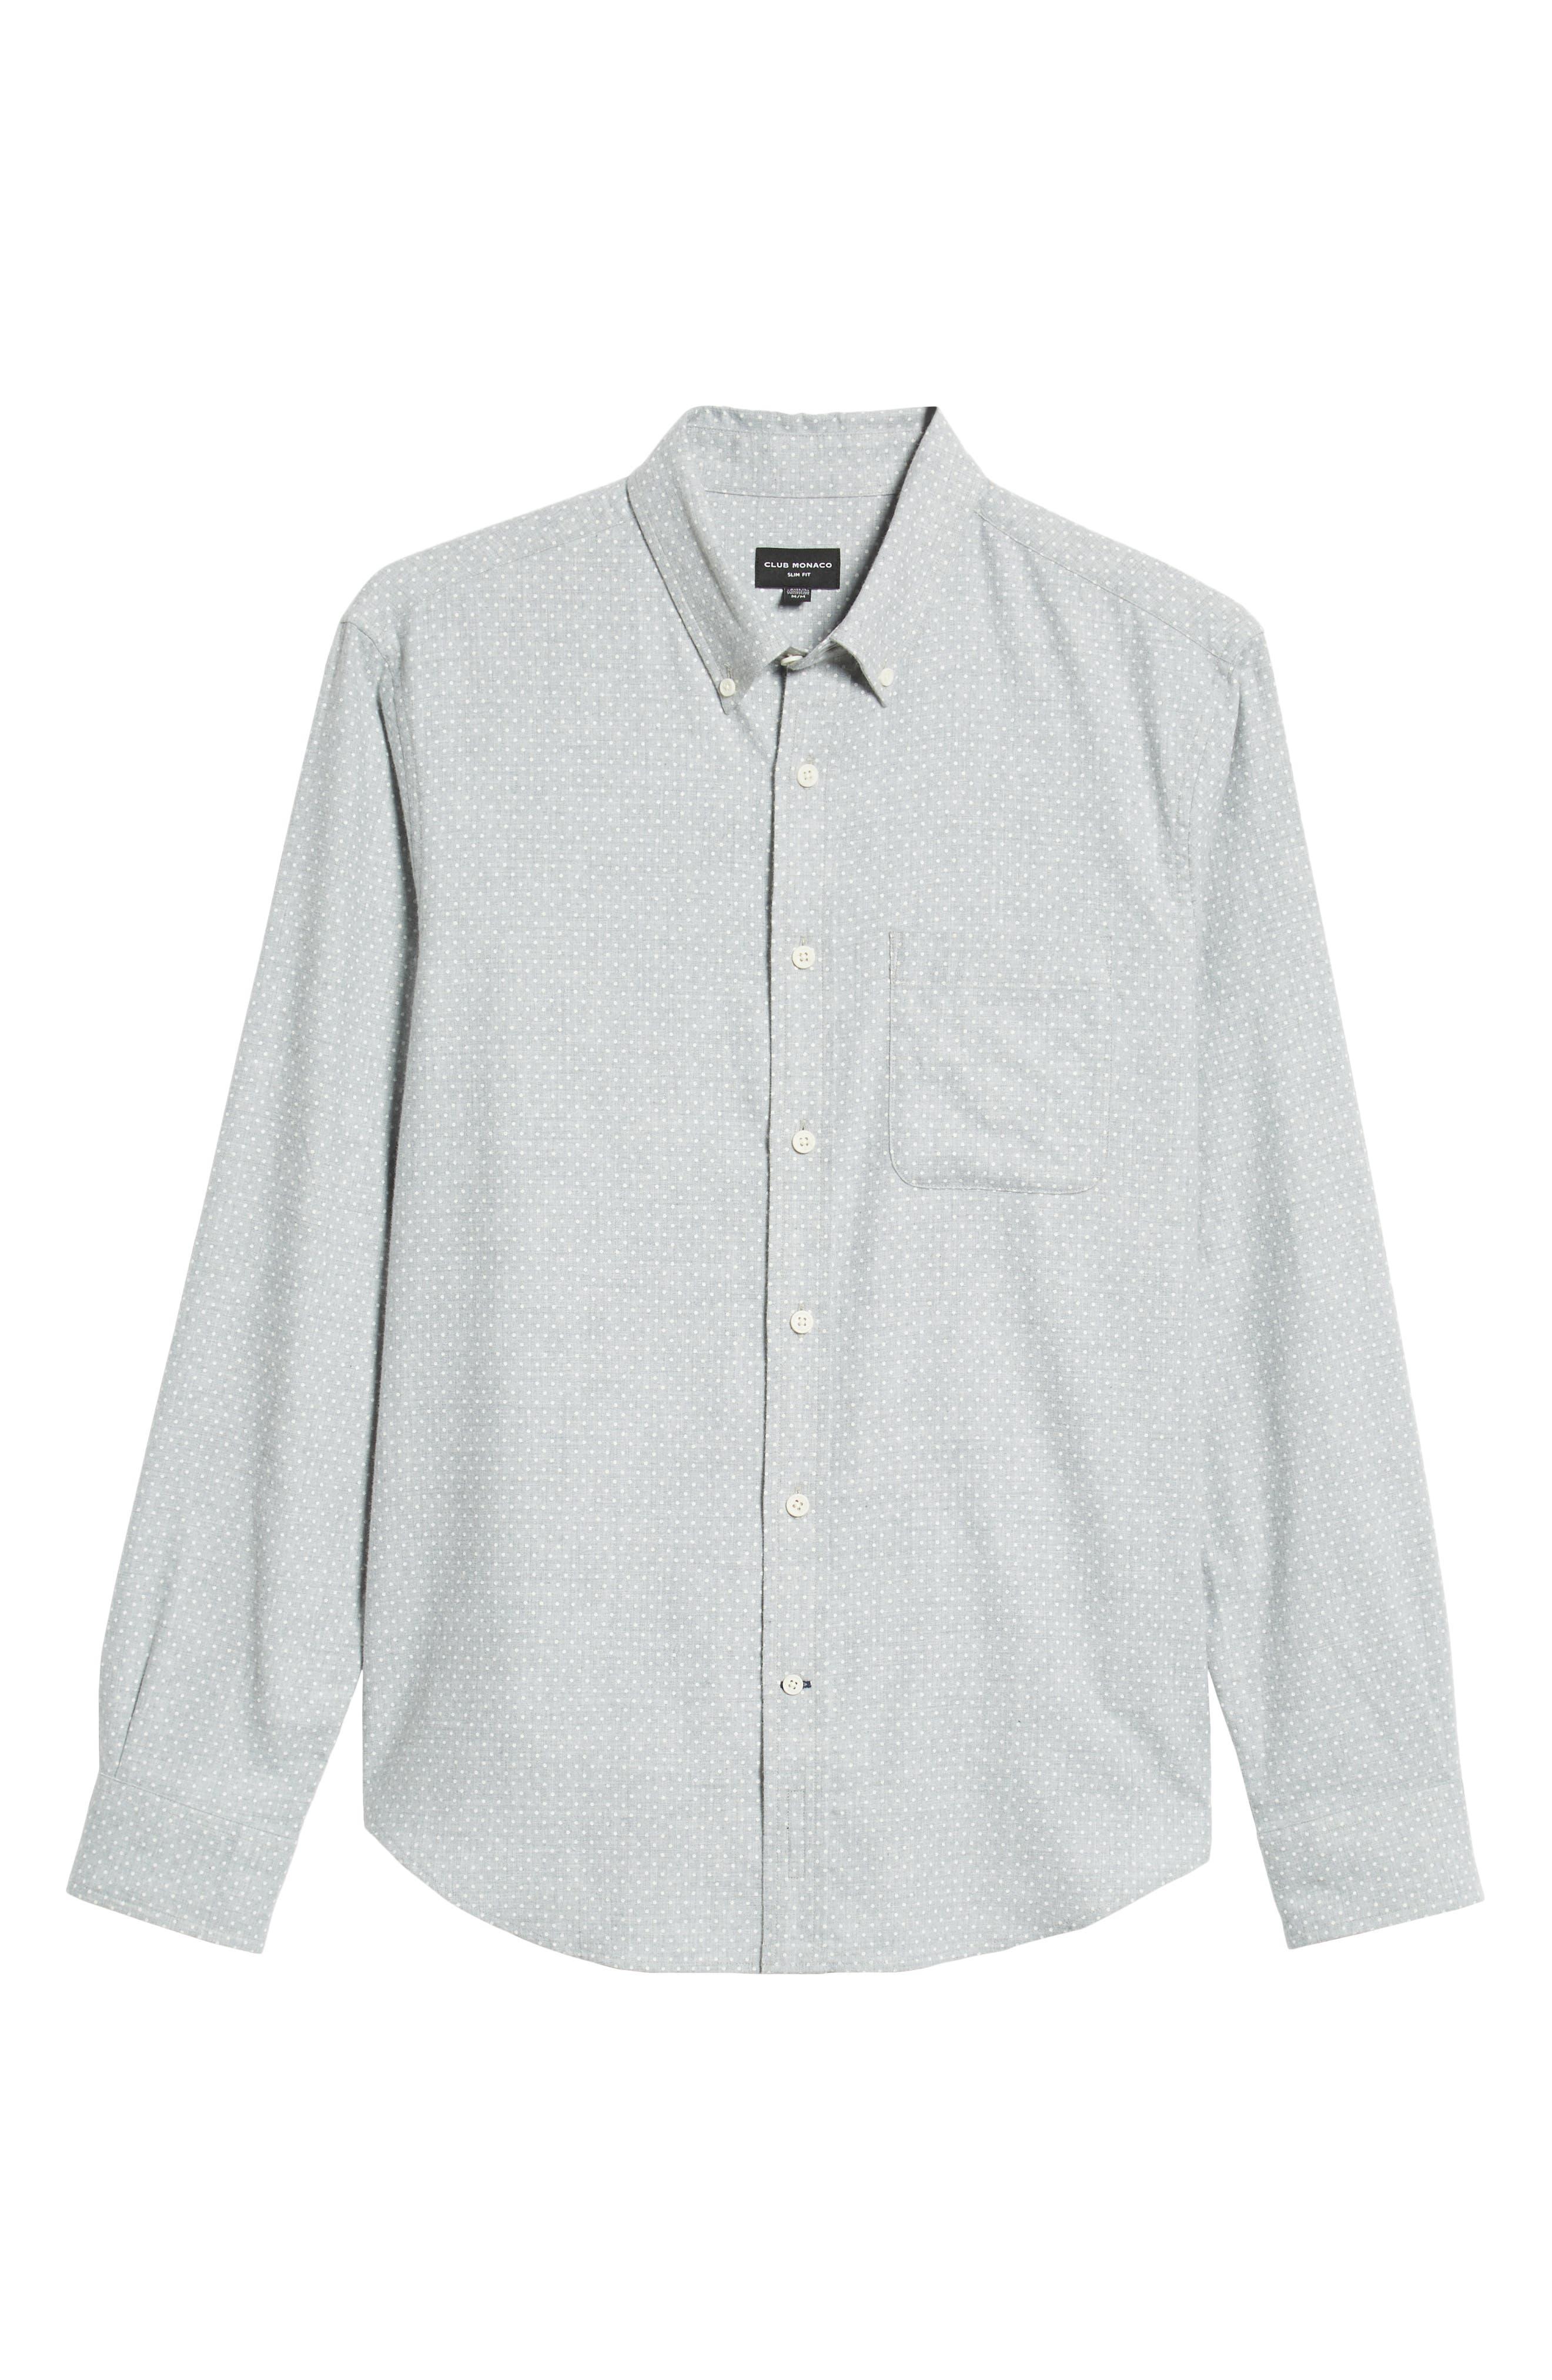 Polka Dot Cotton Flannel Sport Shirt,                             Alternate thumbnail 5, color,                             030